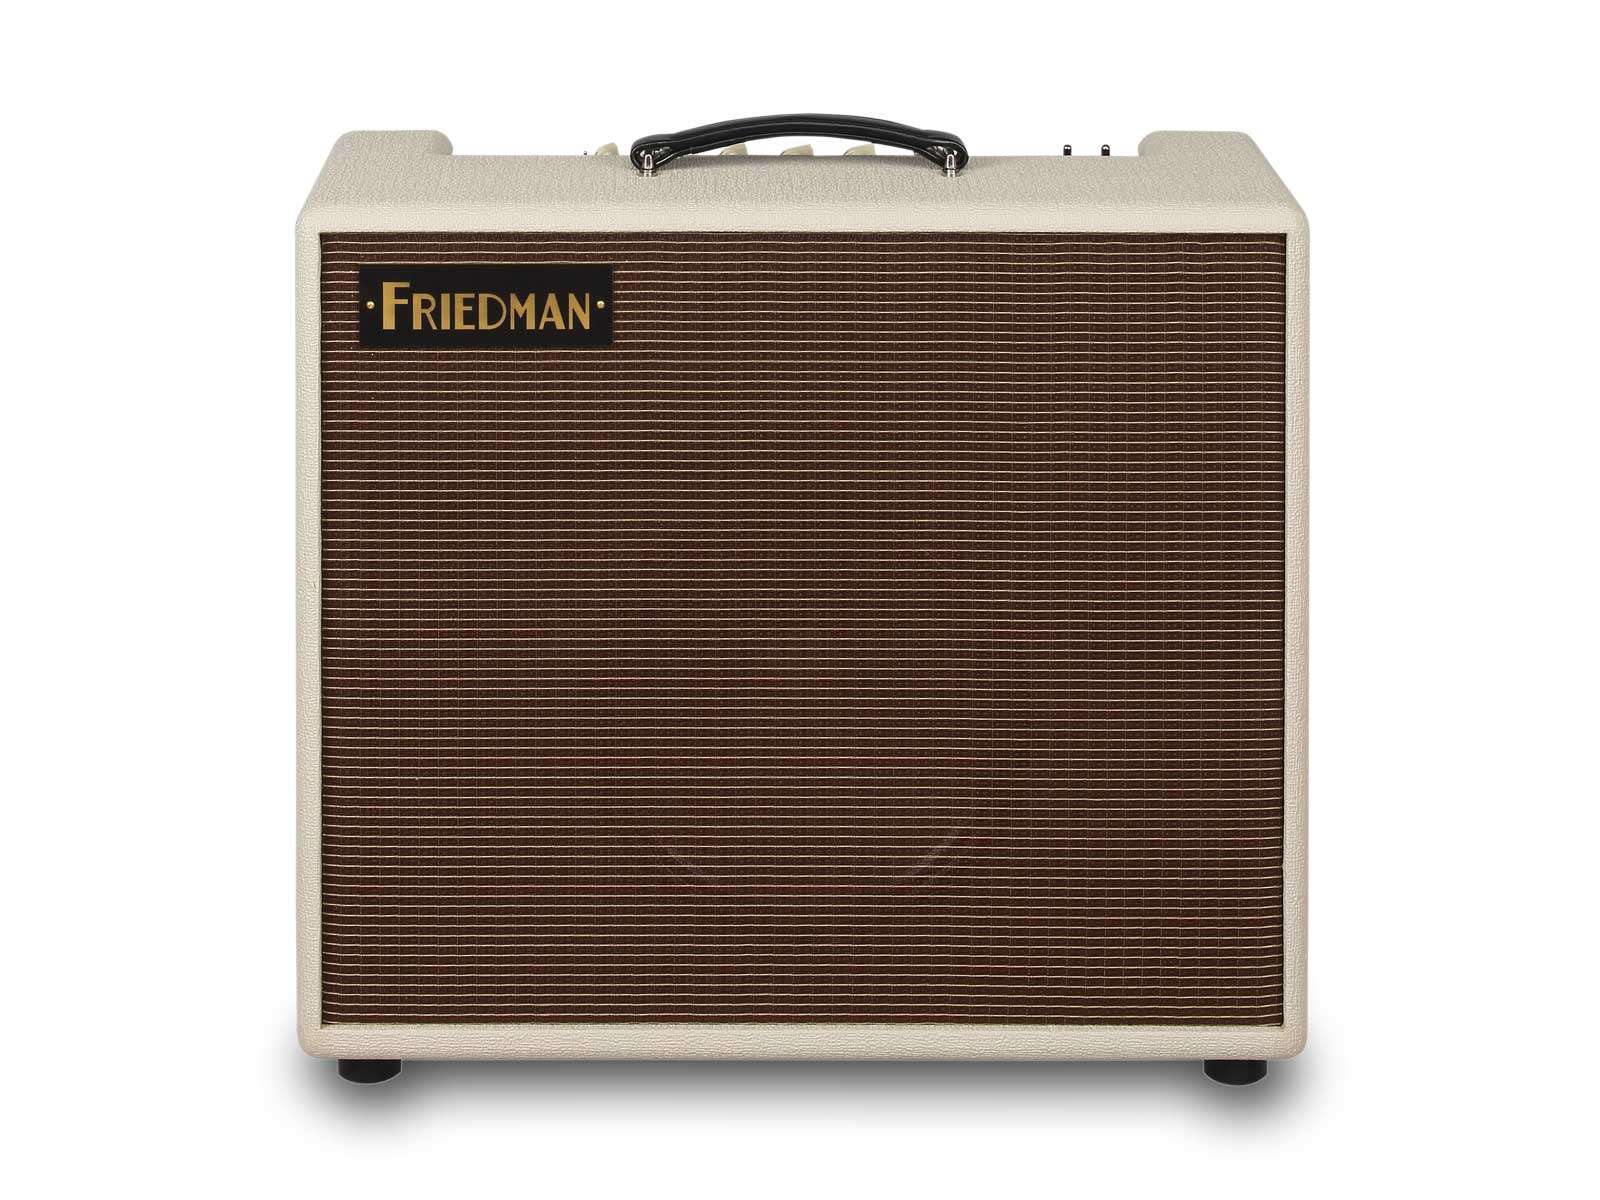 Friedman Amplification   BUXOM BETTY COMBO 1600x1200